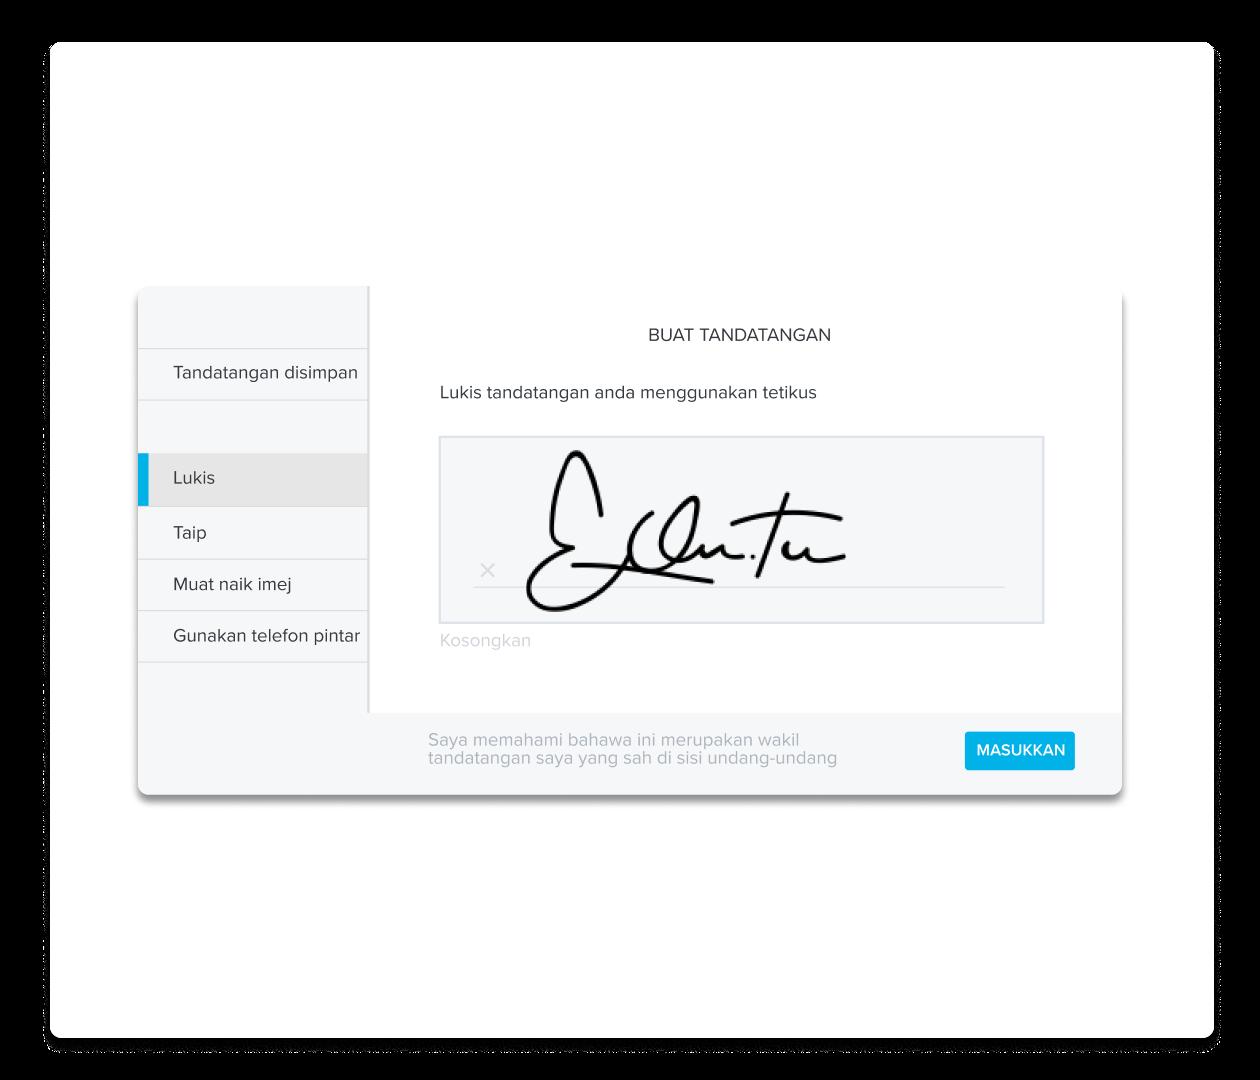 Tangkapan skrin pengalaman mencipta tandatangan HelloSign